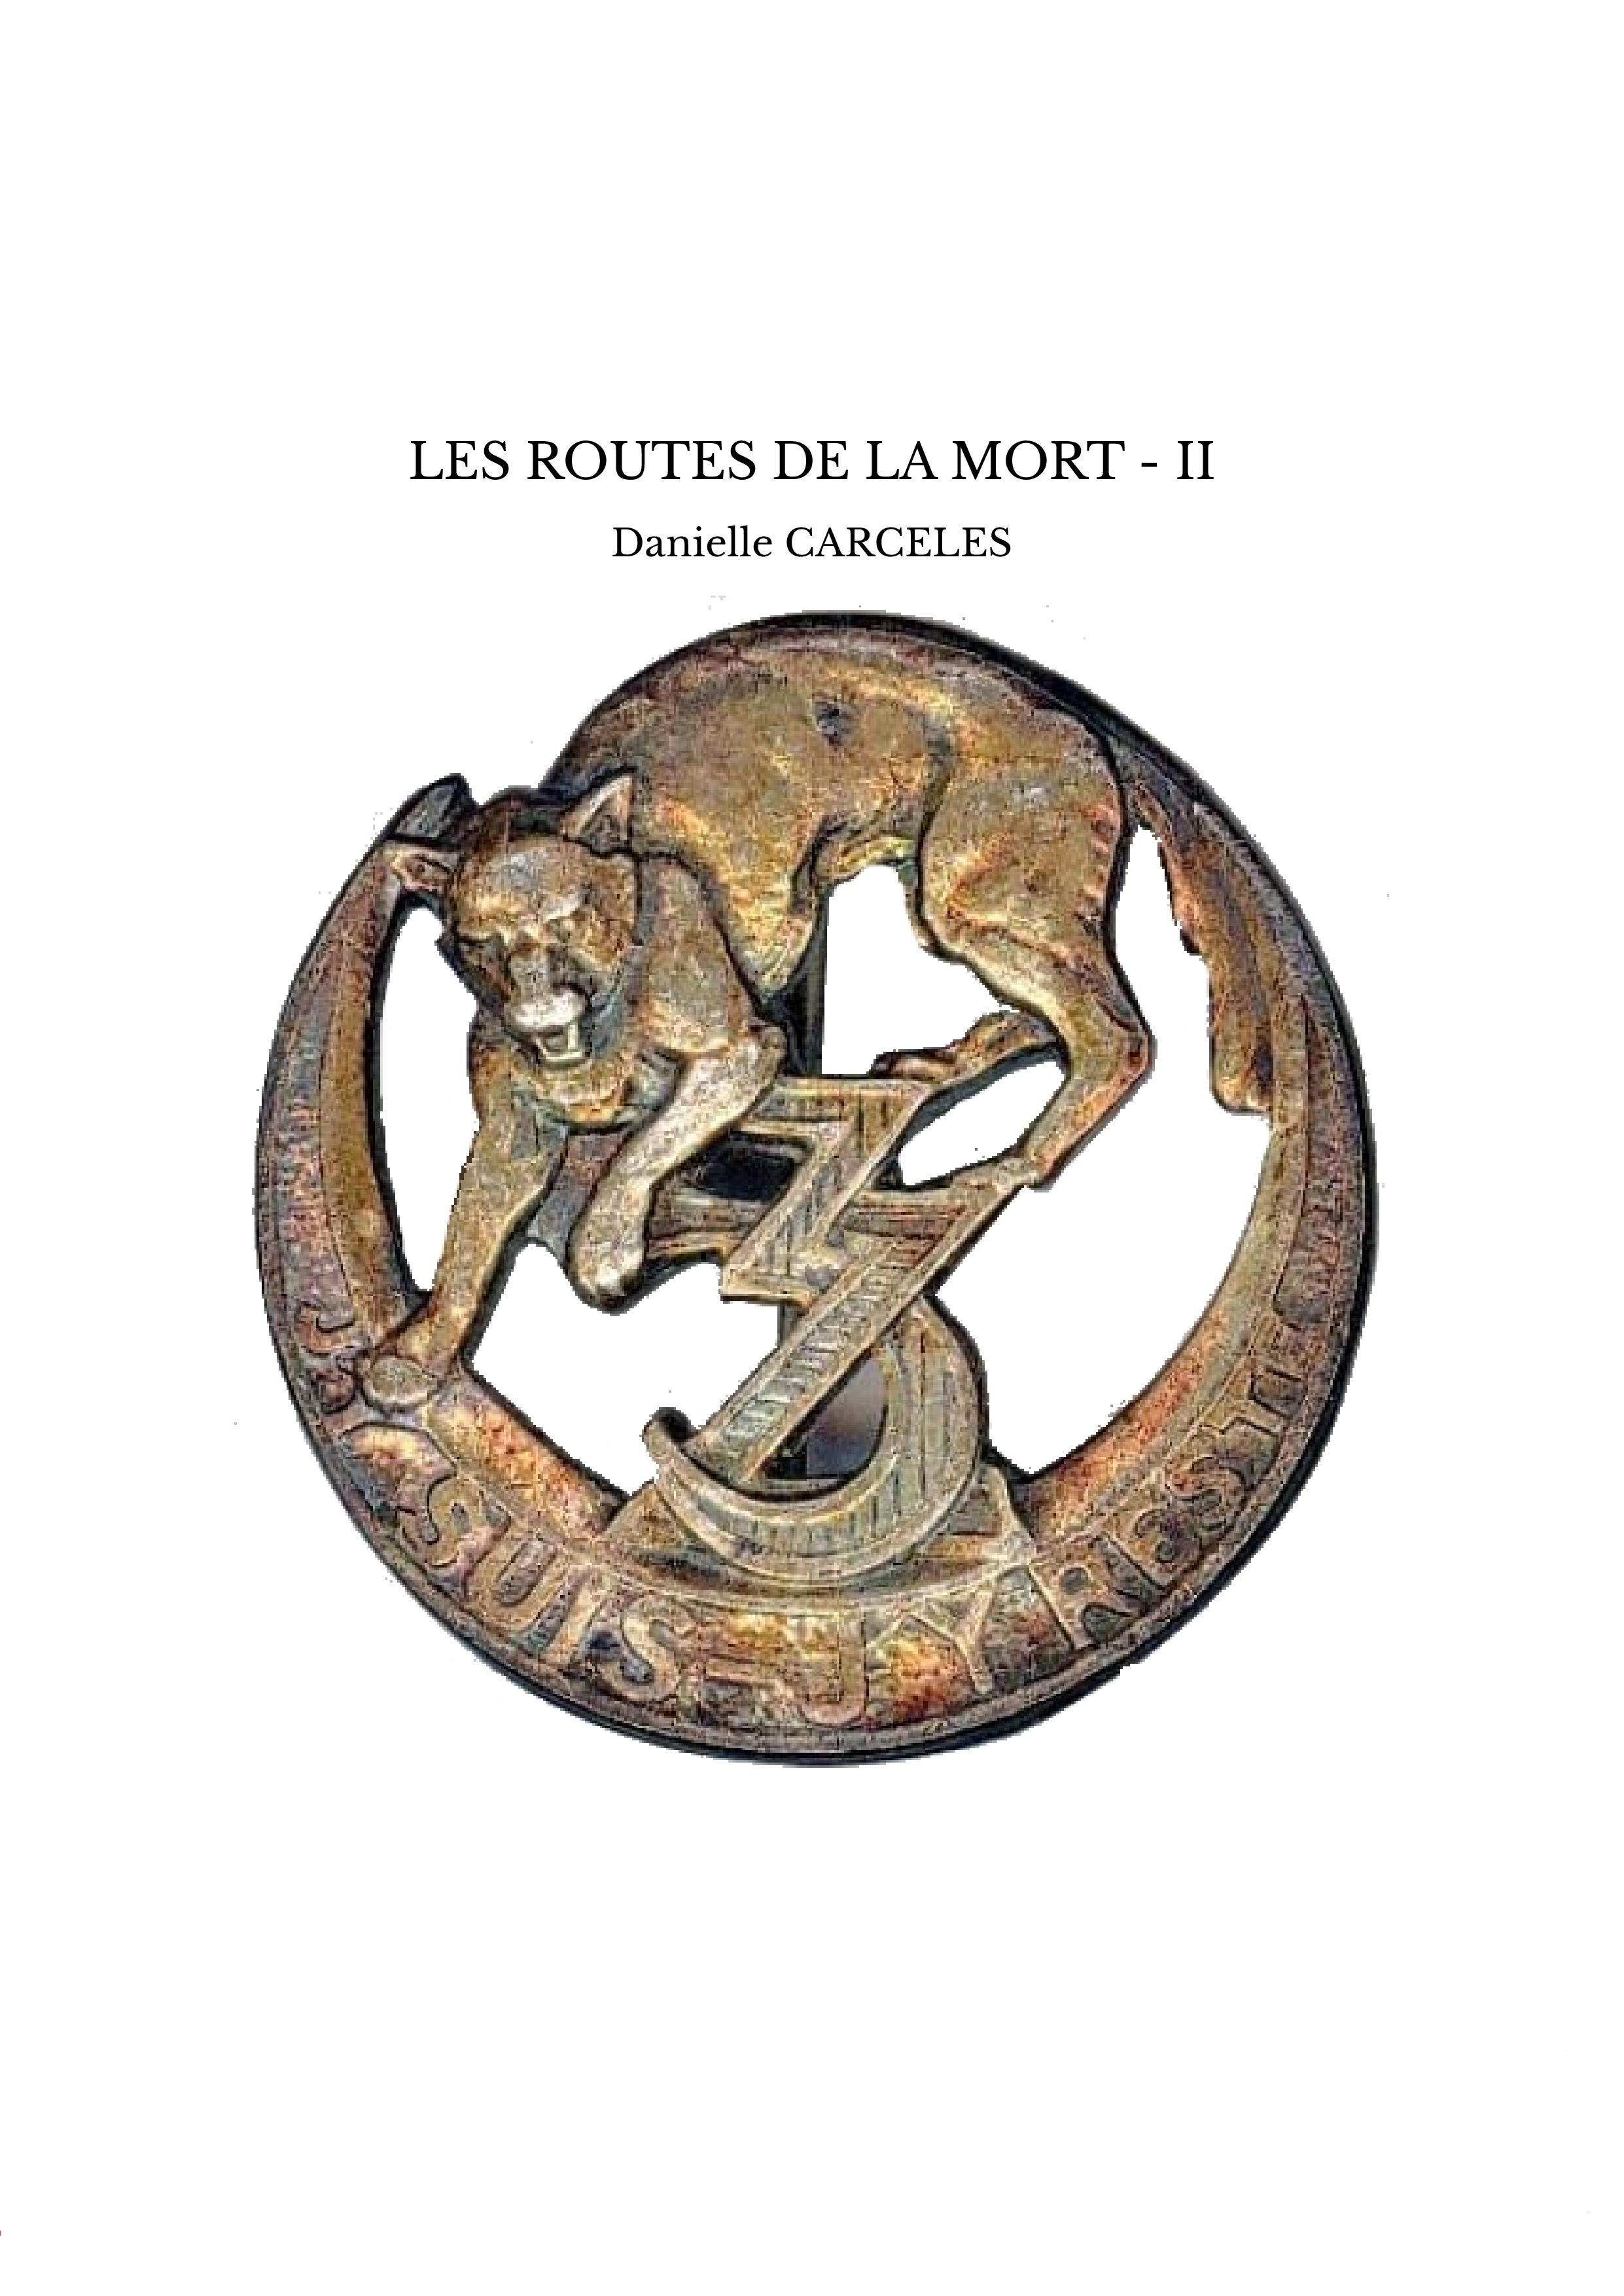 LES ROUTES DE LA MORT - II